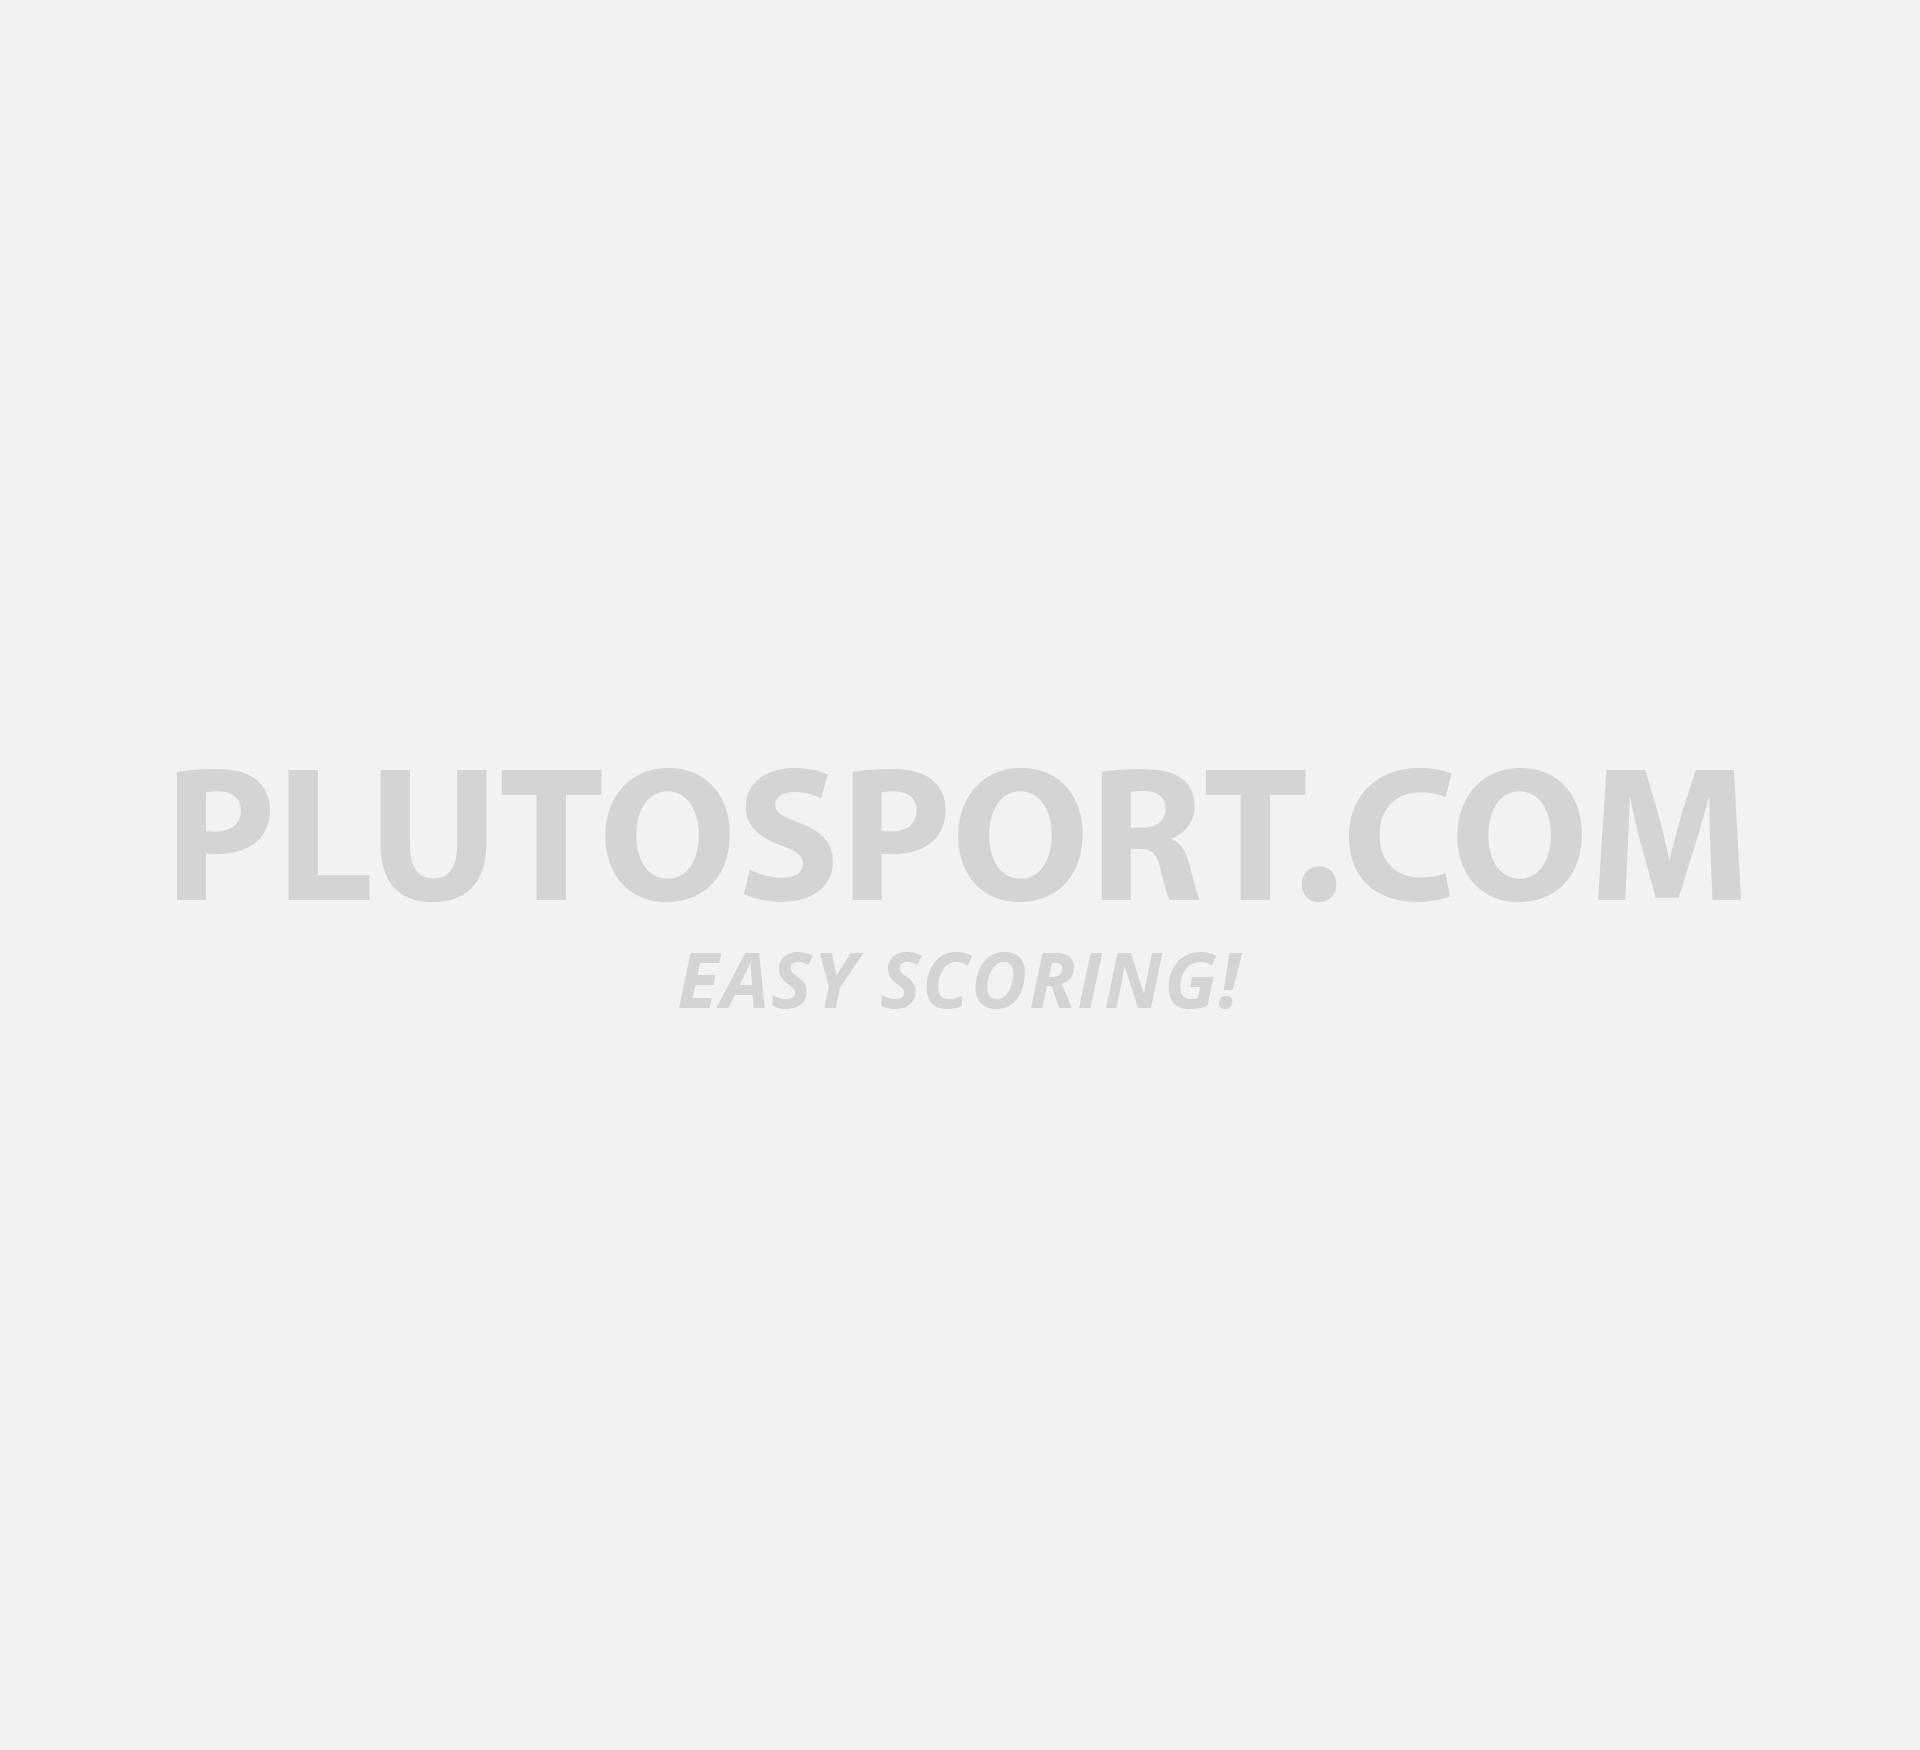 1c6854c009bb62 Bergstein Kids Rainboots - Rain boots - Shoes - Outdoor - Sports |  Plutosport